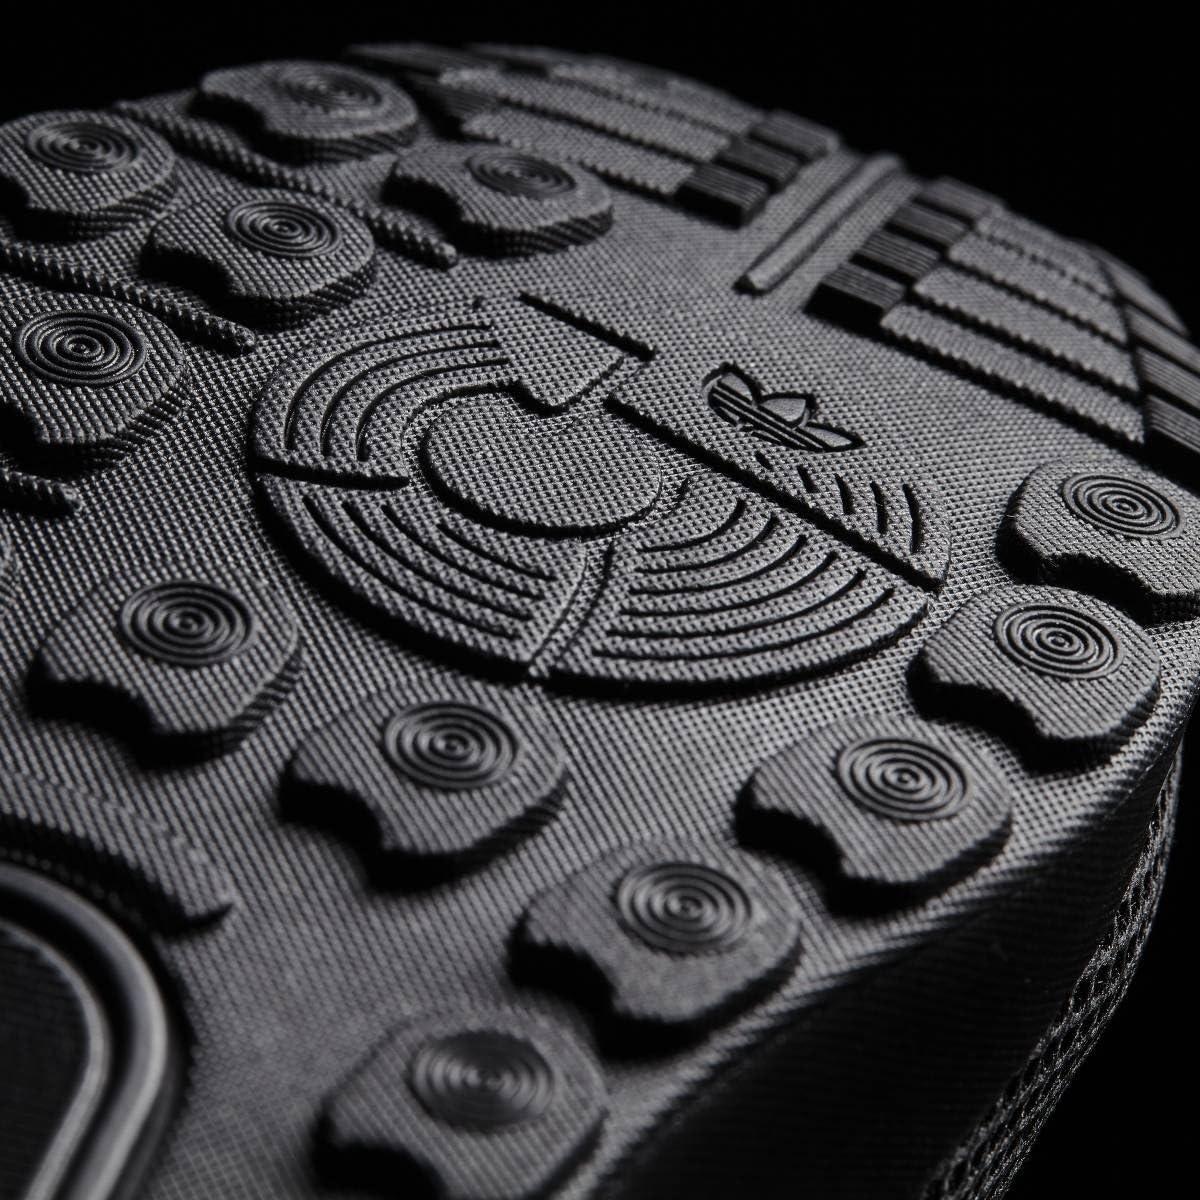 Adidas Zx Flux Racer Cblack Cblack Ftwwht